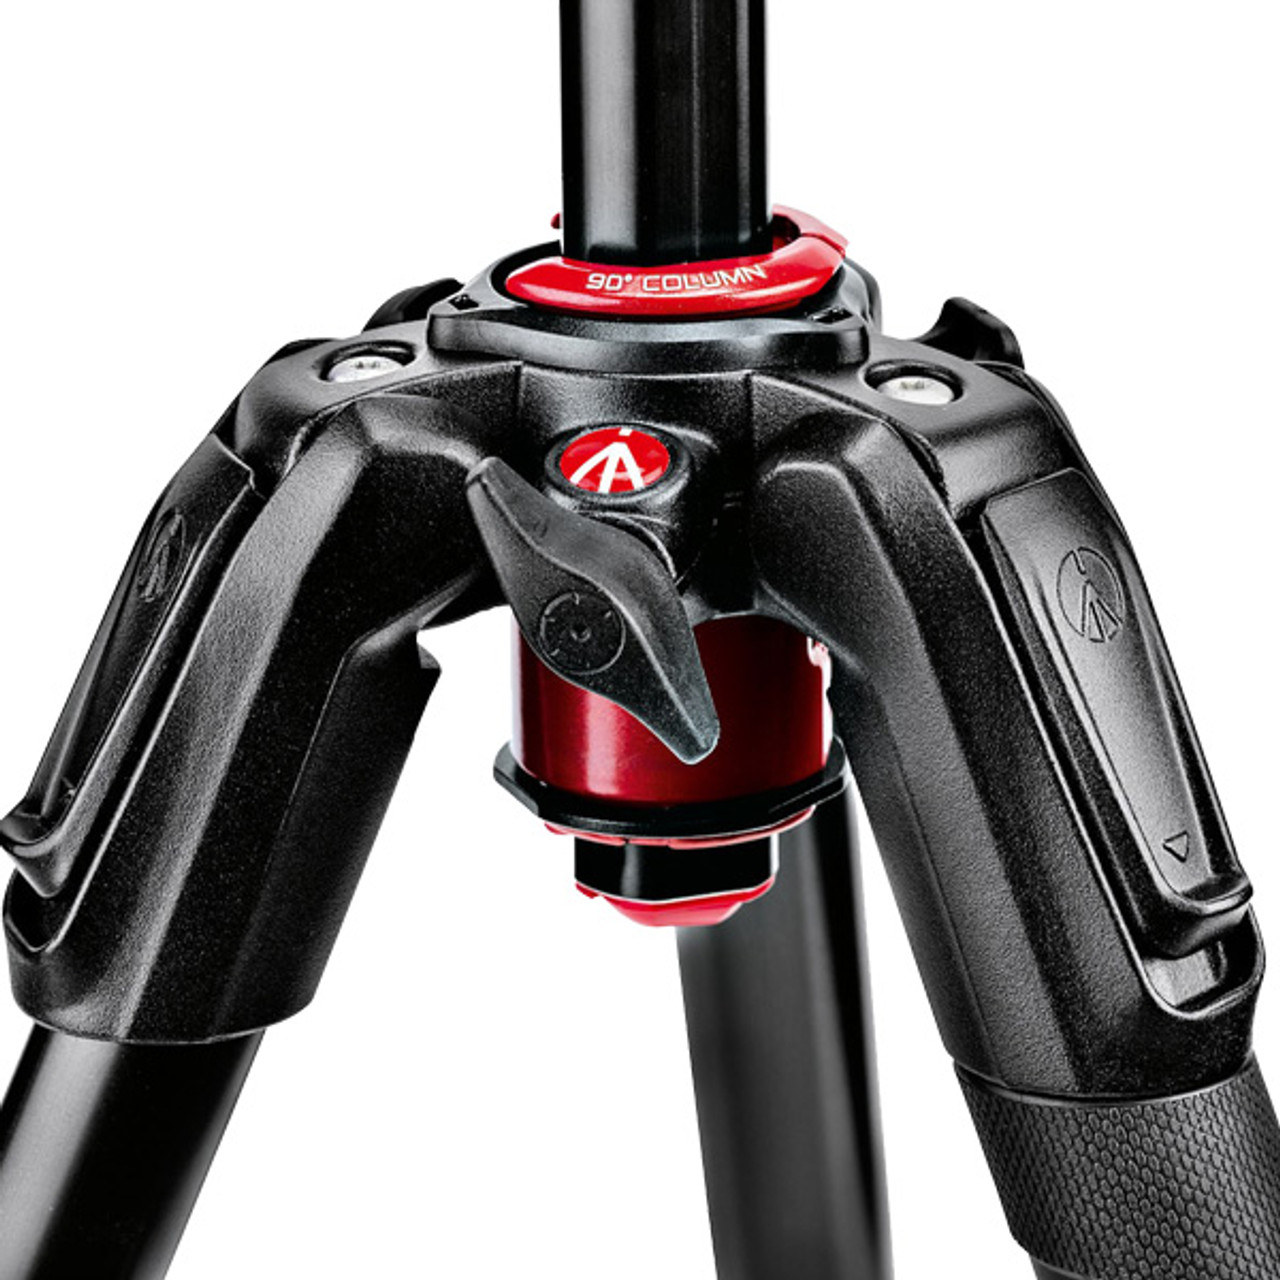 Manfrotto 190 GO! M-Series Aluminum Tripod 4-Section M-Lock